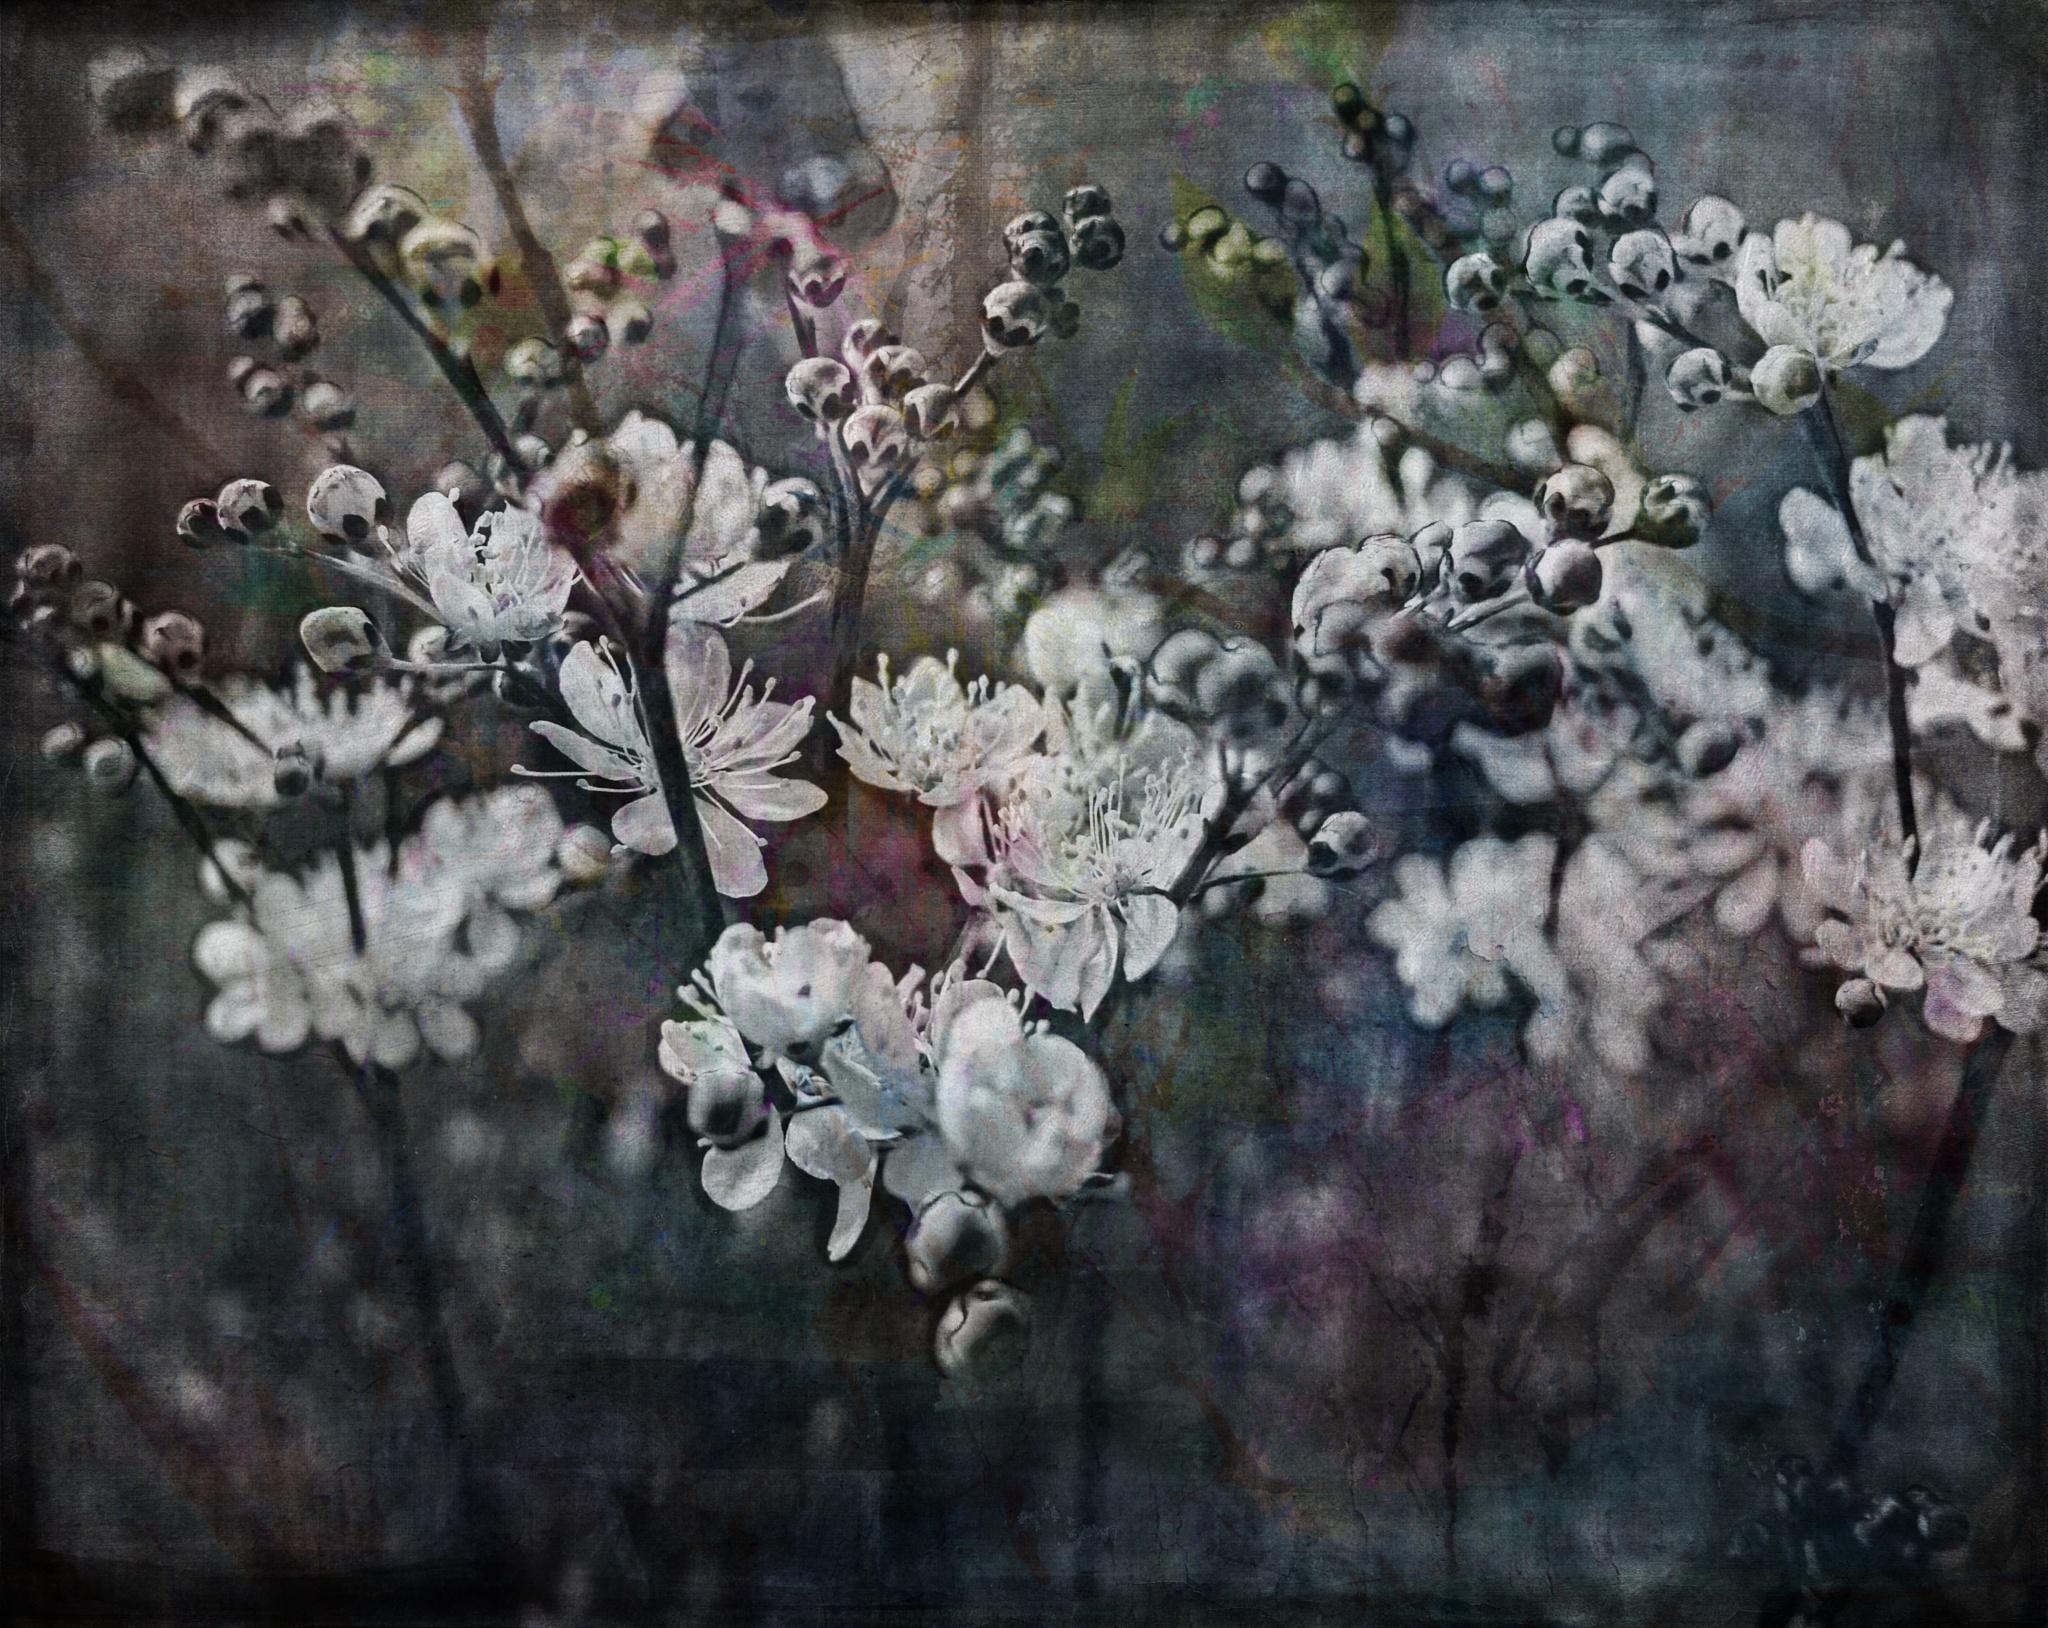 Untitled by mminoguekarlsson